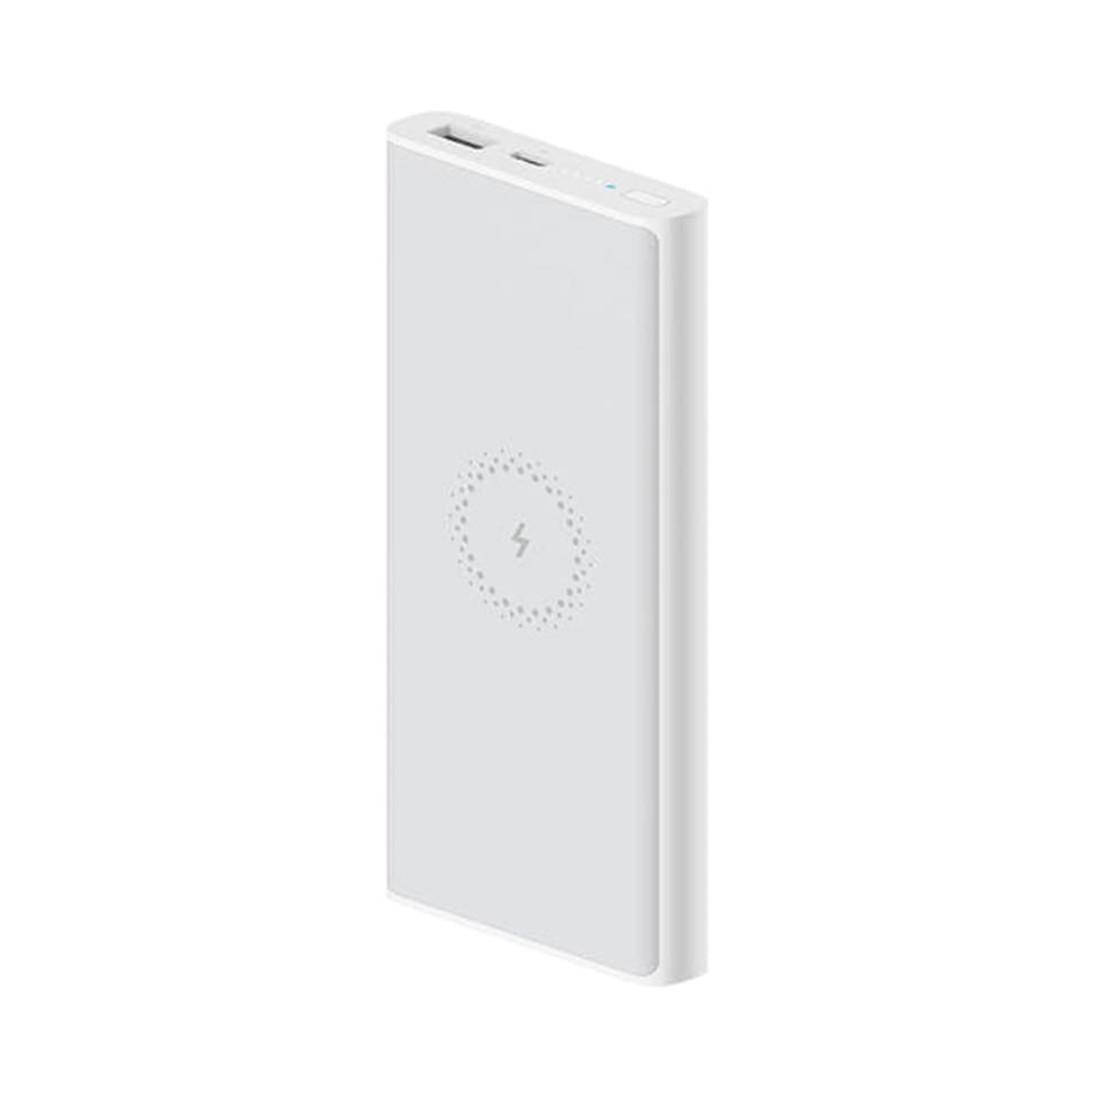 Портативное зарядное устройство Xiaomi Mi Power Bank 10000mAh Wireless Essential Белый